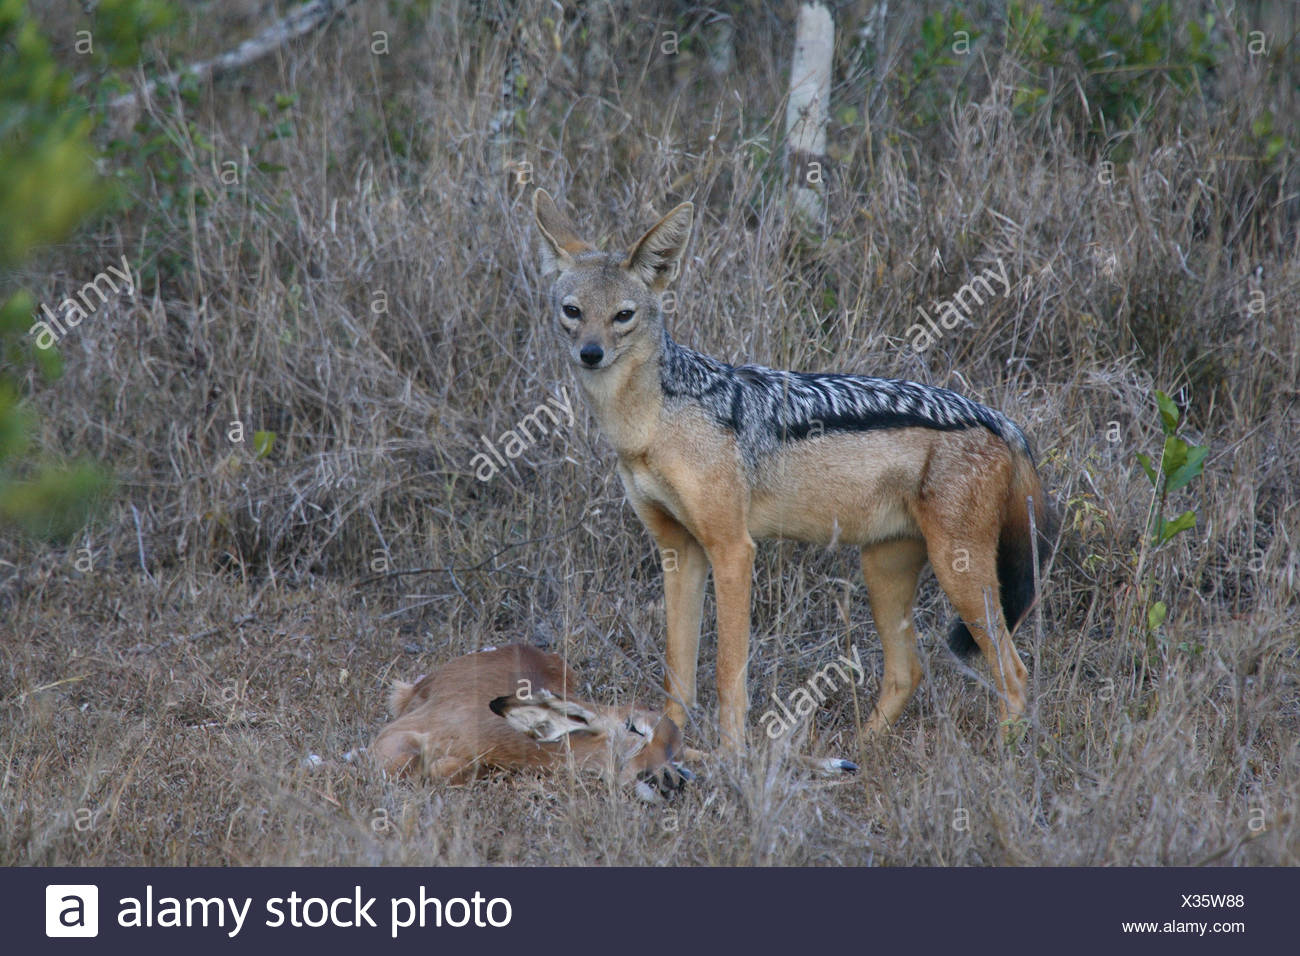 Schabrackenschakal Canis mesomelas loot gazelle Africa Kenya wildlife wilderness Wildlife animal game-animal mammal carnivore - Stock Image